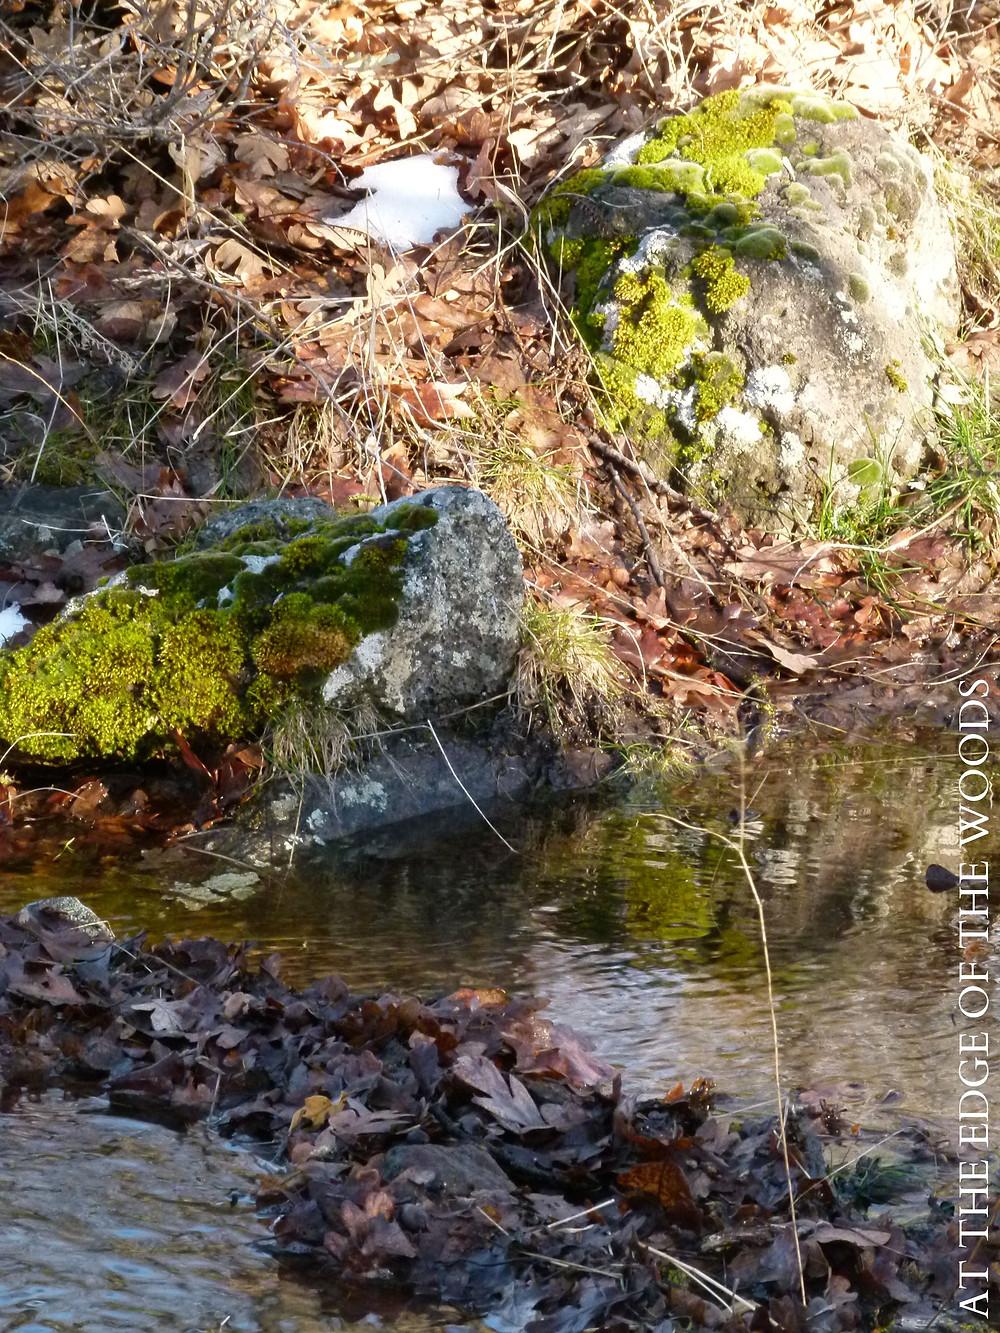 flowing water reflects light on mossy rocks